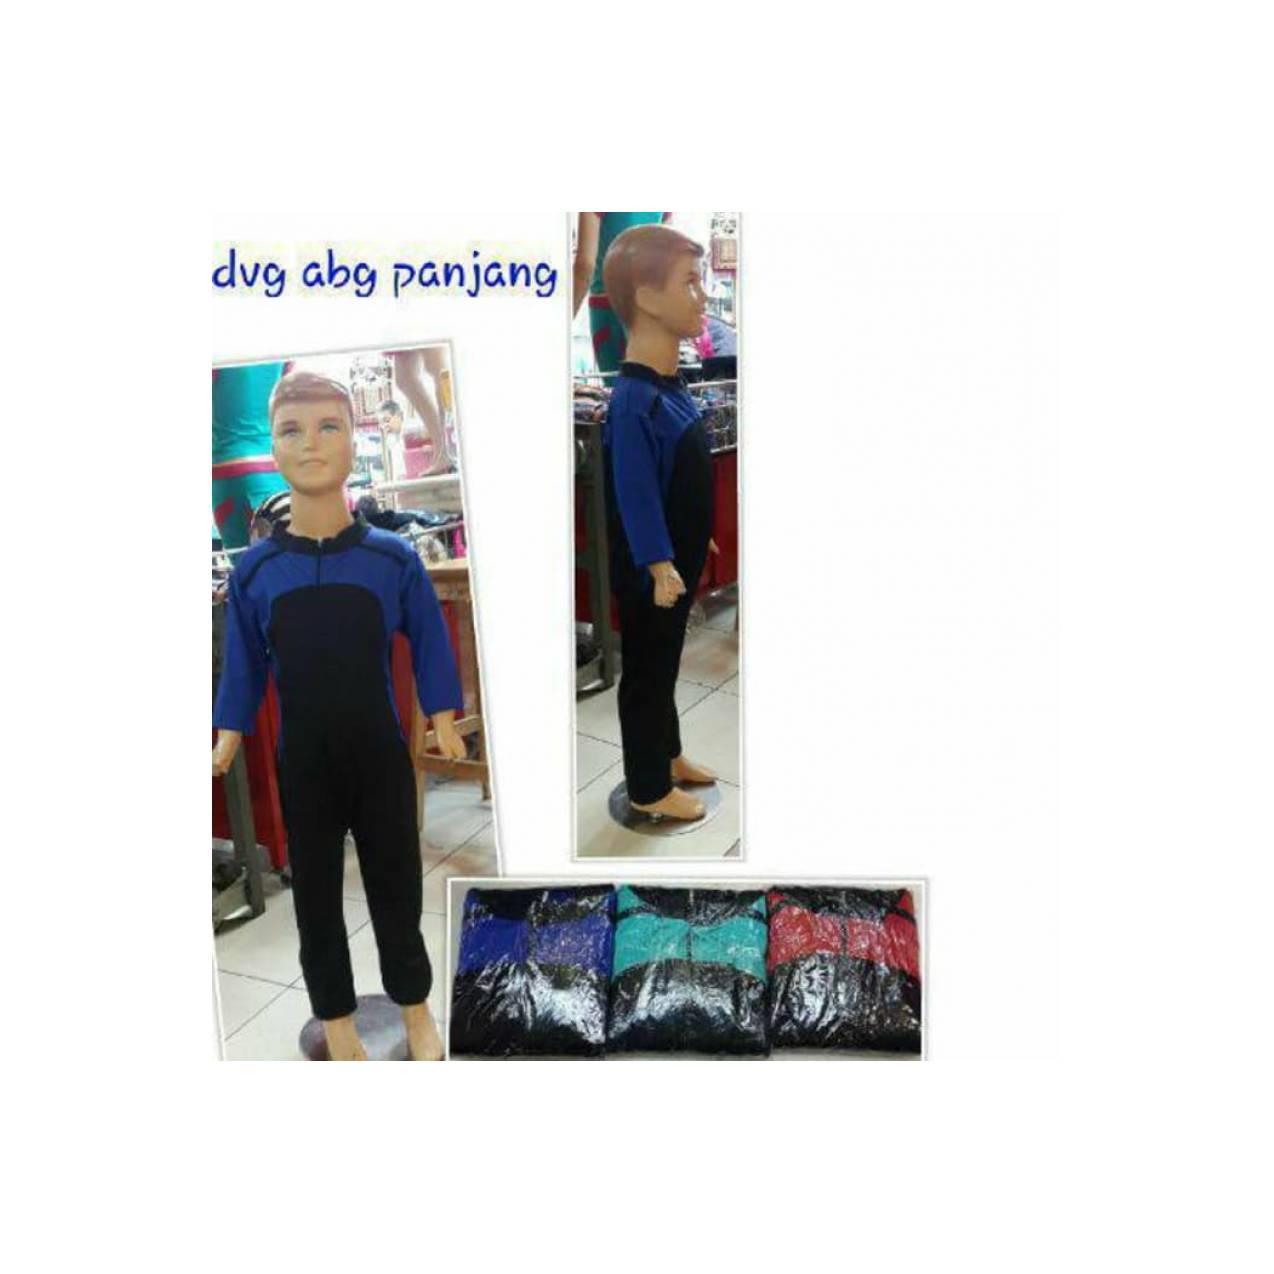 SwimSuit (Baju Renang) Diving BOY Anak SD (kisaran 7-10 tahun)